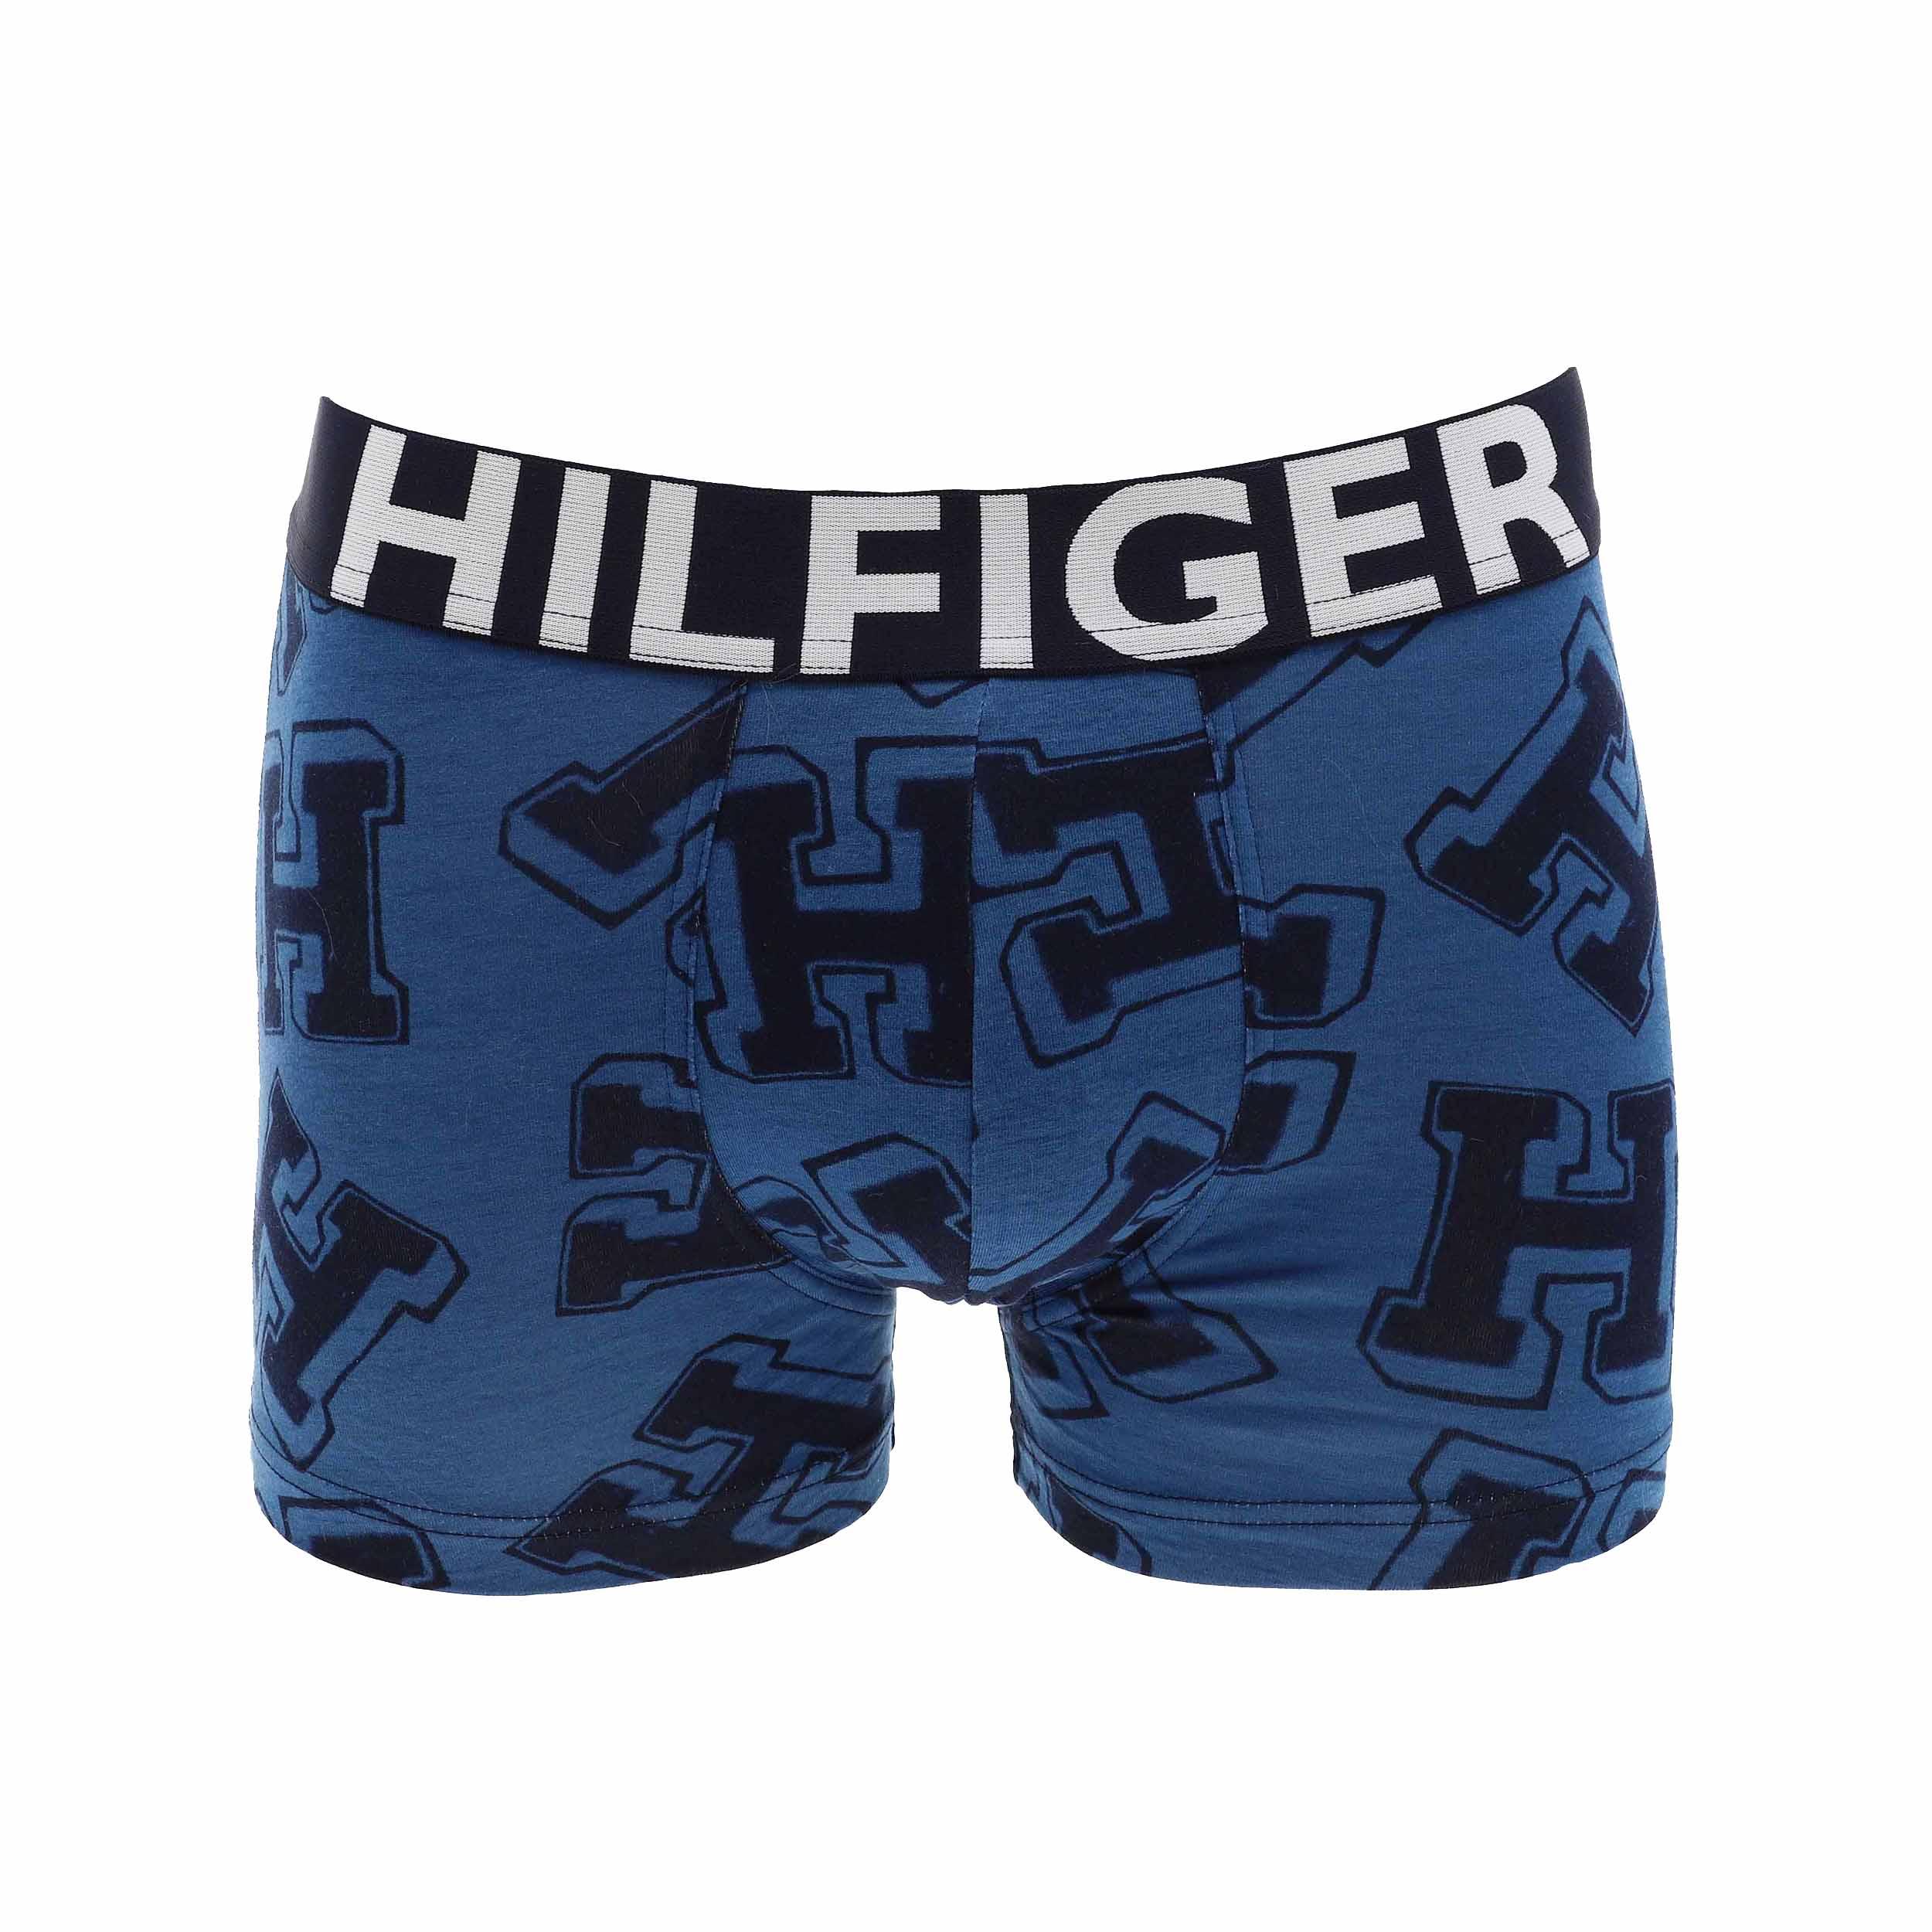 Boxer tommy hilfiger en coton stretch bleu pétrole monogrammé en bleu marine